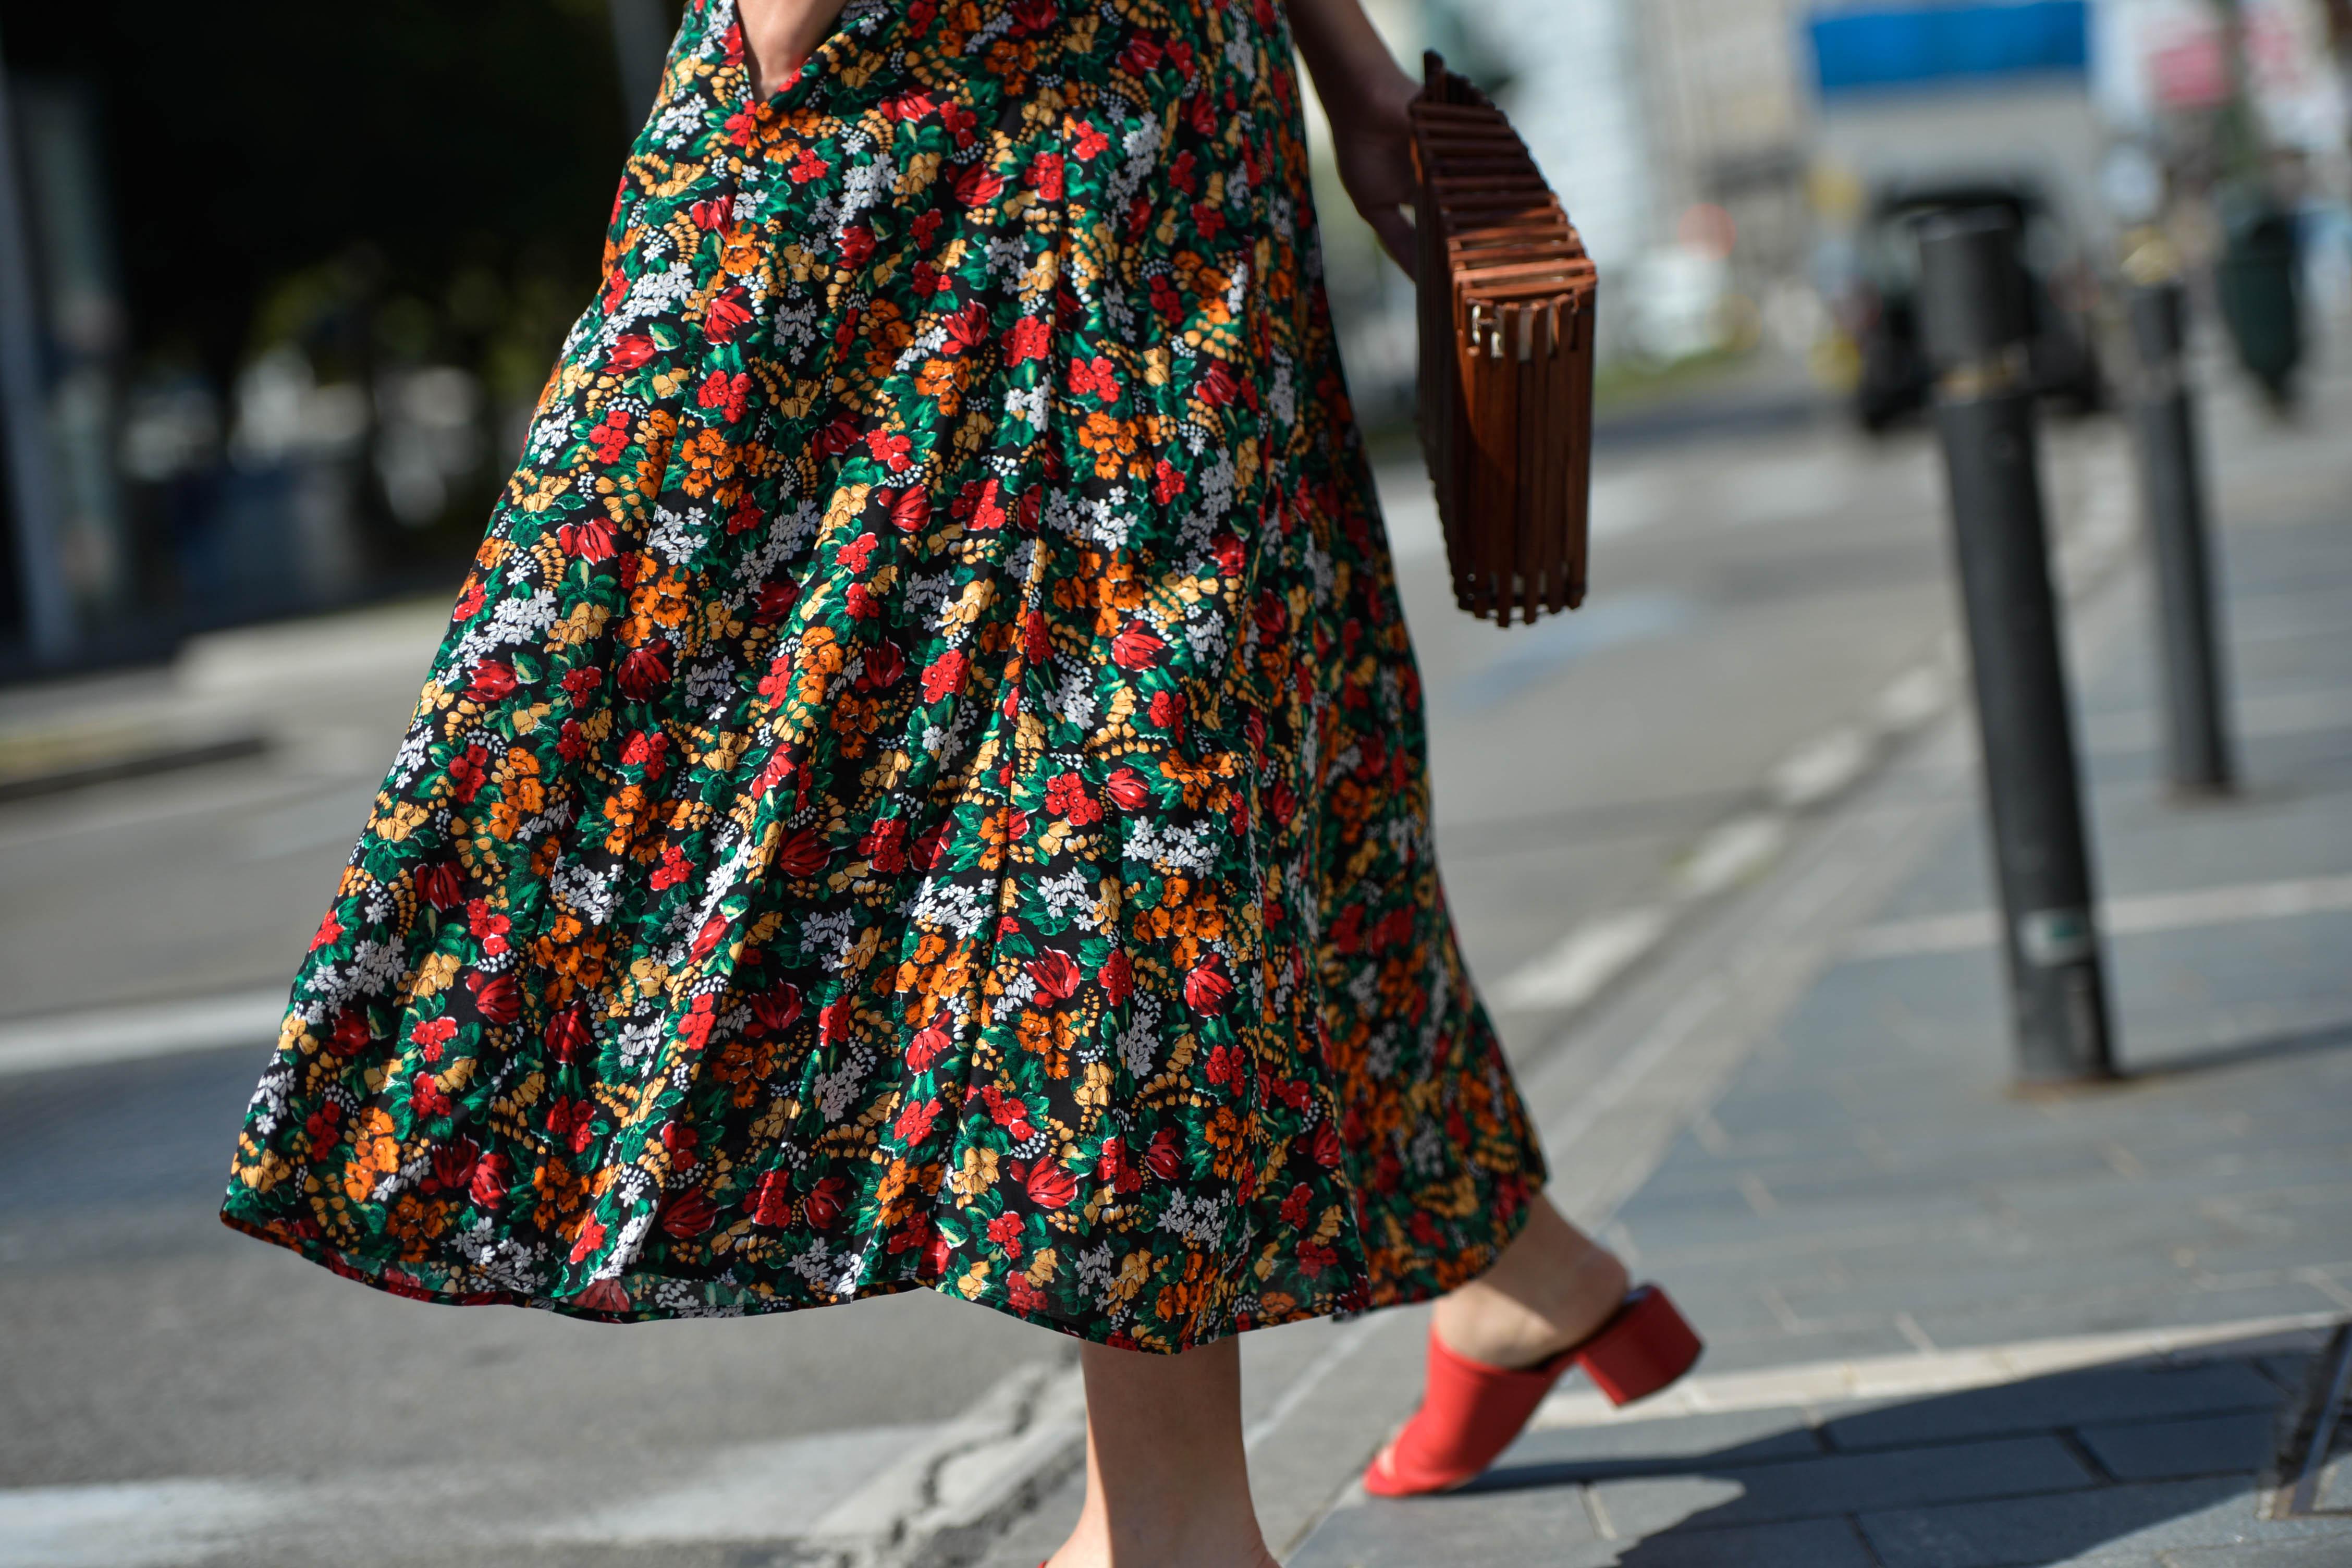 Flowered dress